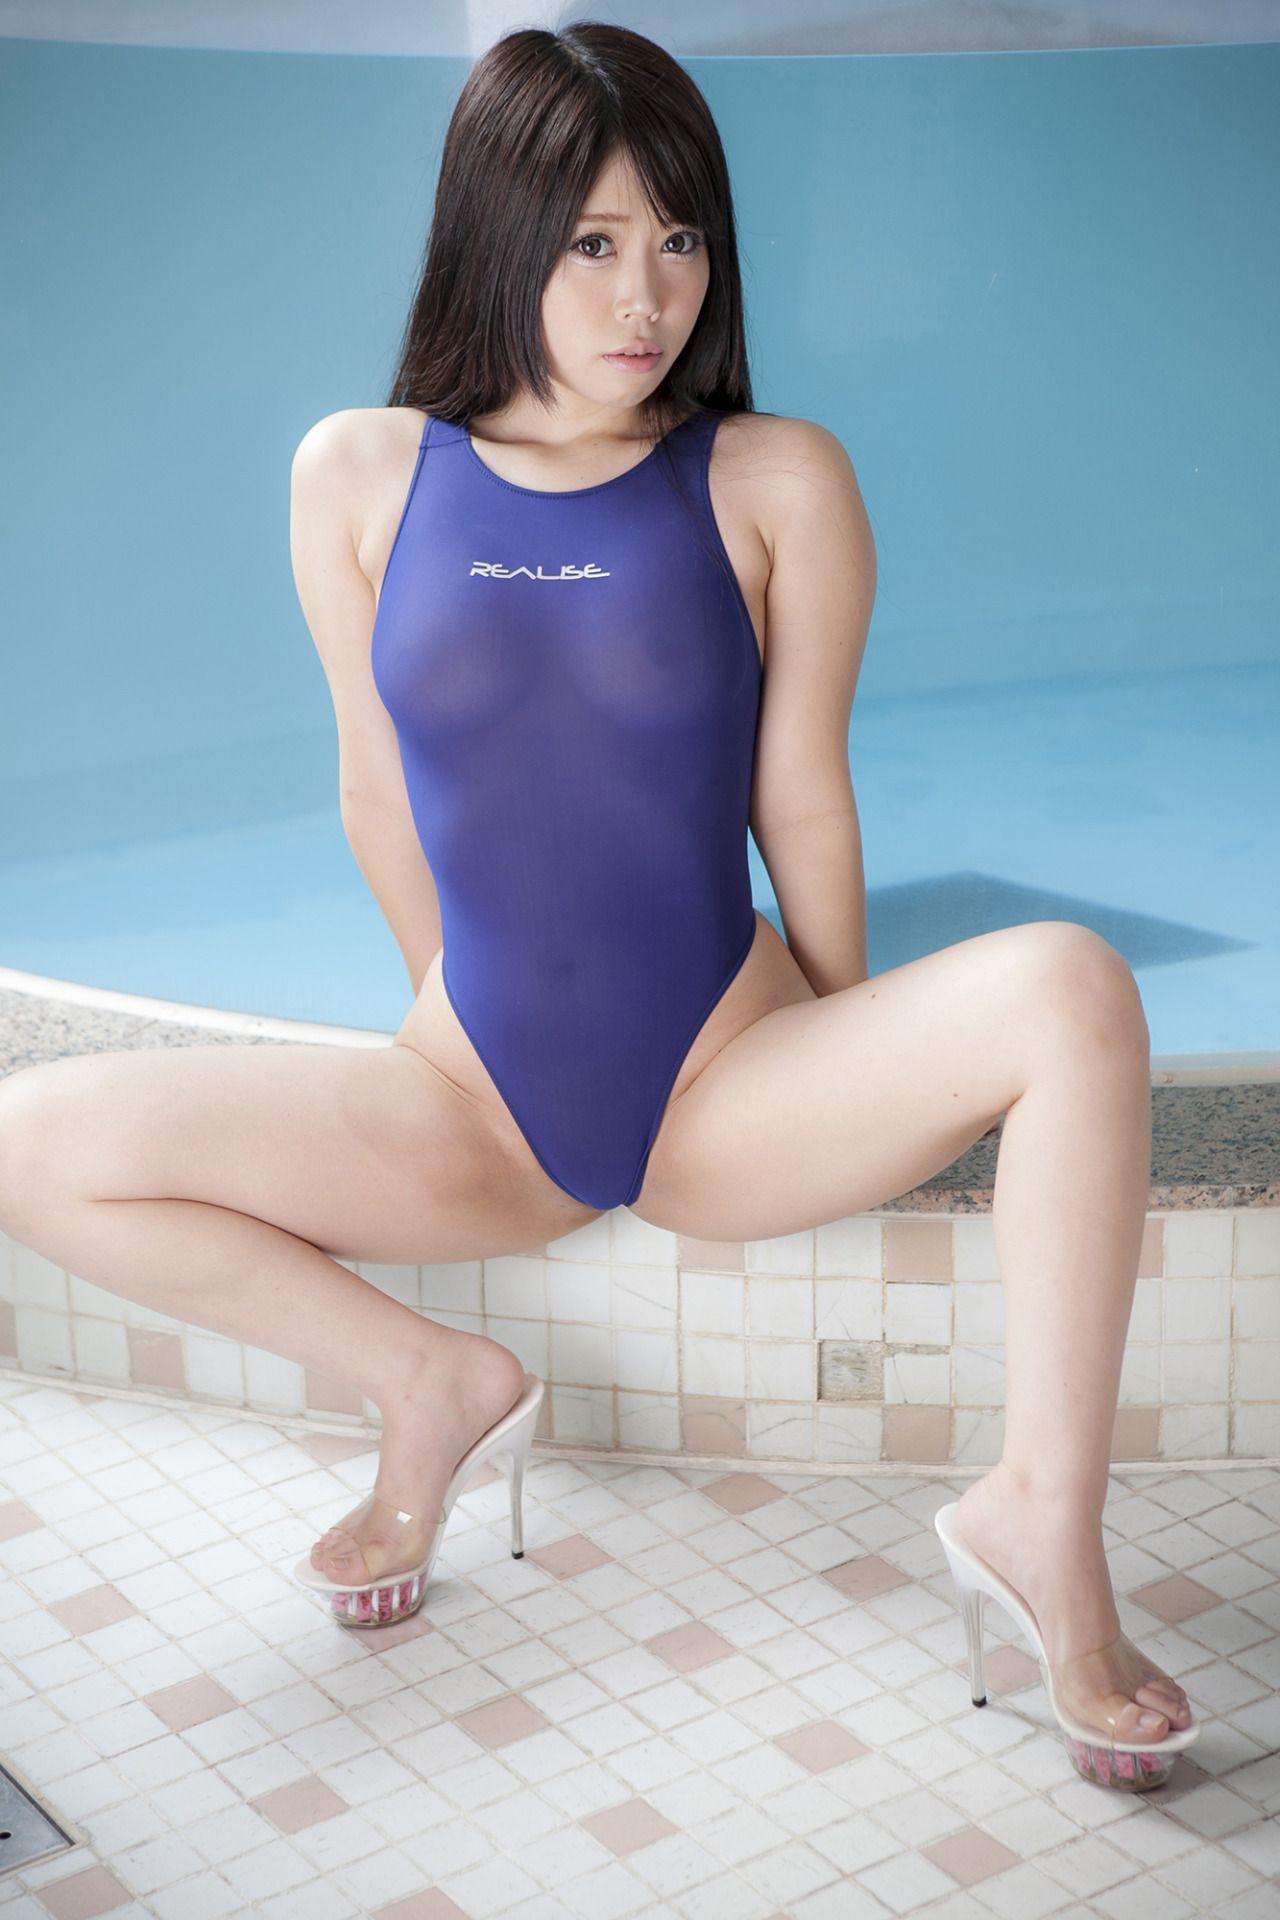 asian-women-inleatards-free-full-length-asian-videos-seekmo